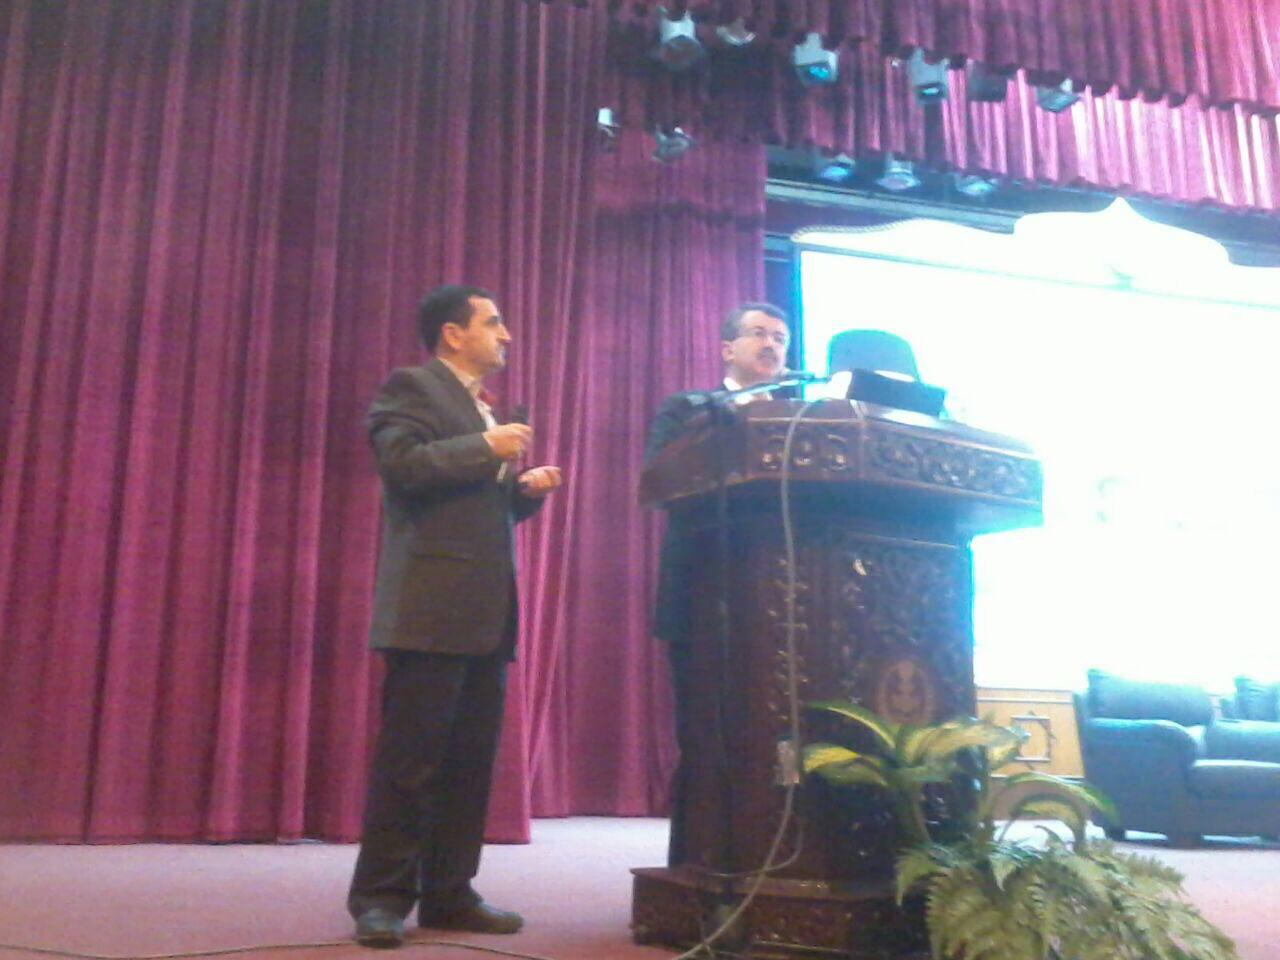 Imam Said Nursi's educational system and Hayrat Foundation model